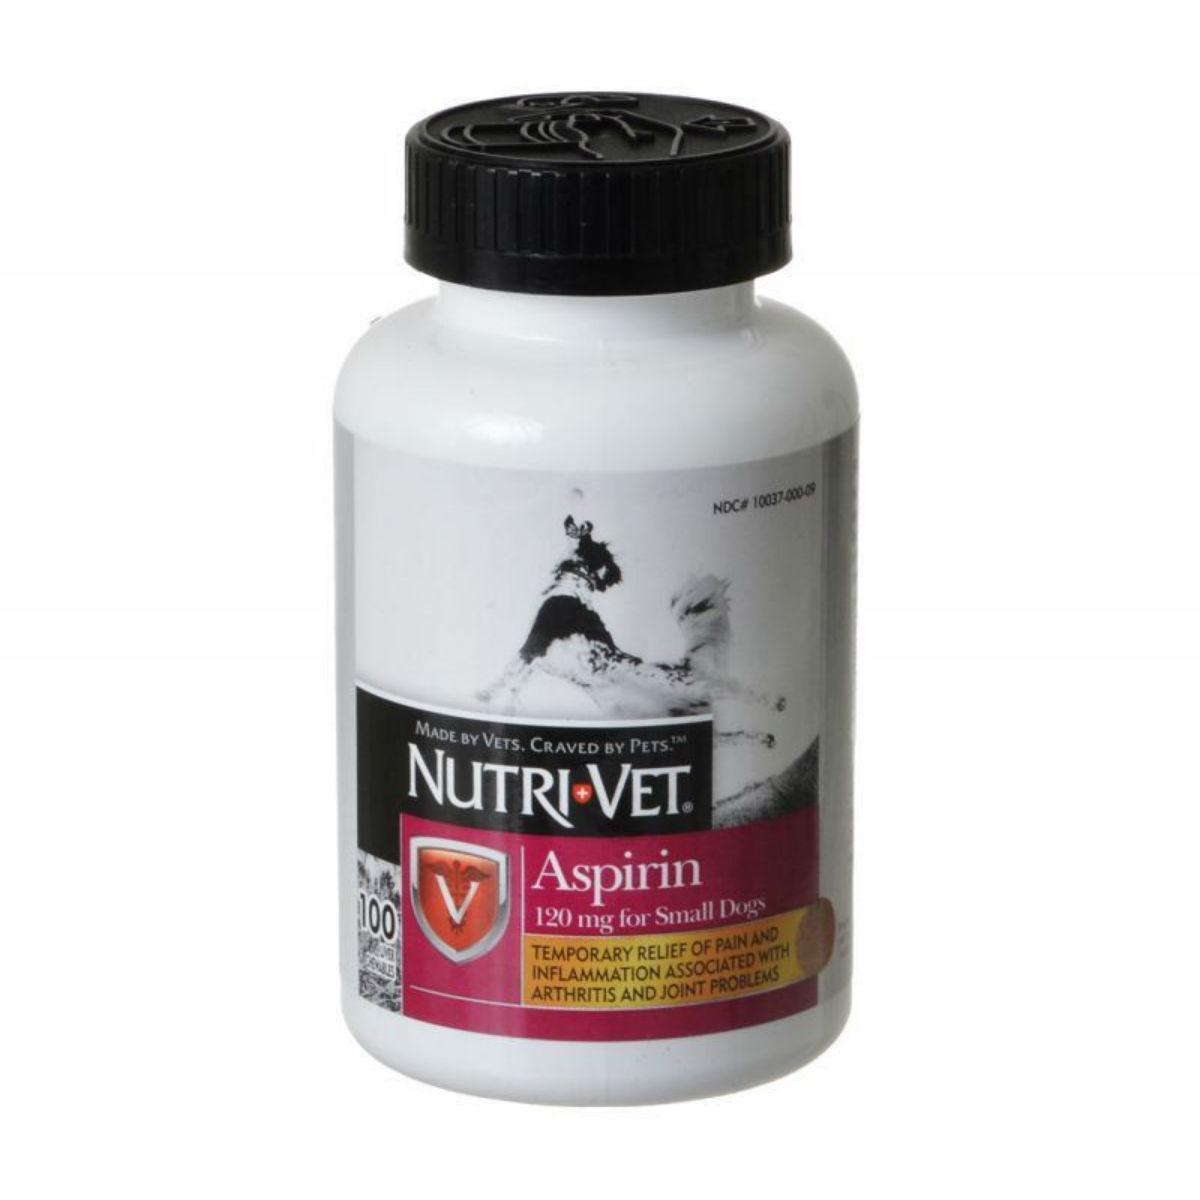 Nutri-Vet K-9 Buffered Aspirin Small Dog Chewable Tablet